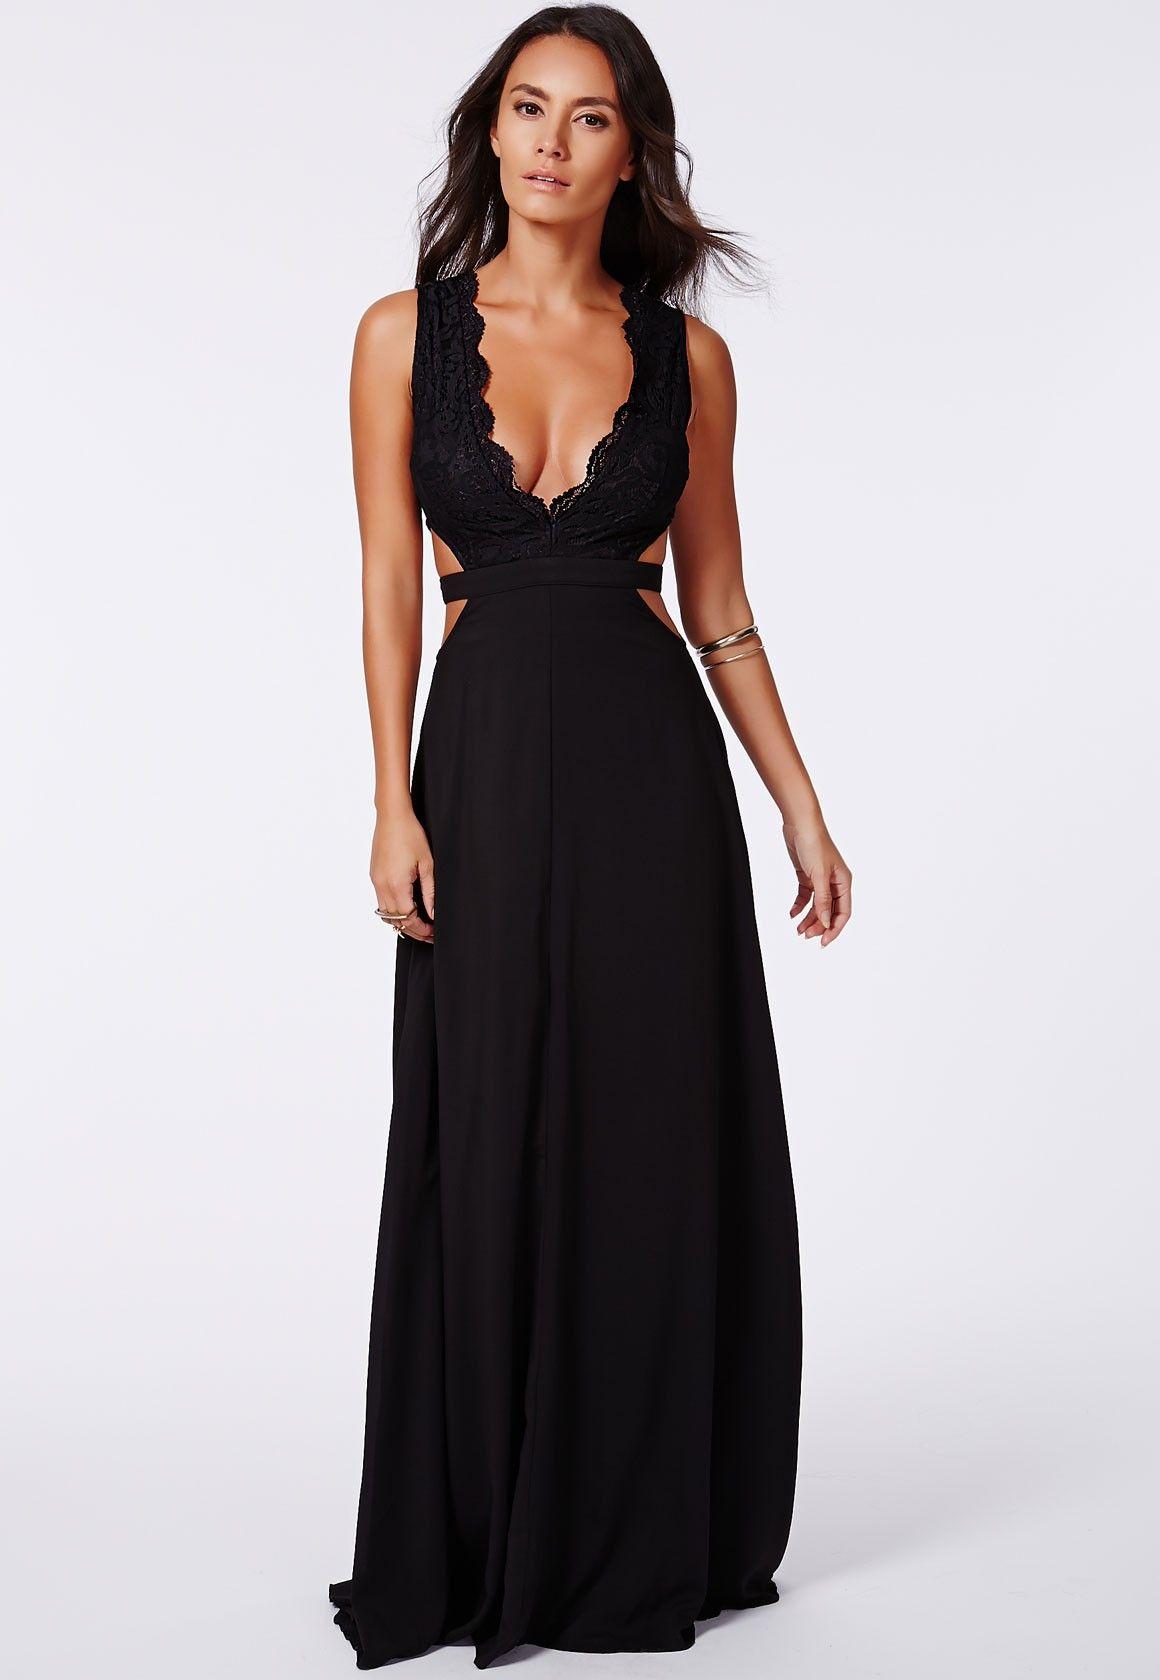 Dress black maxi